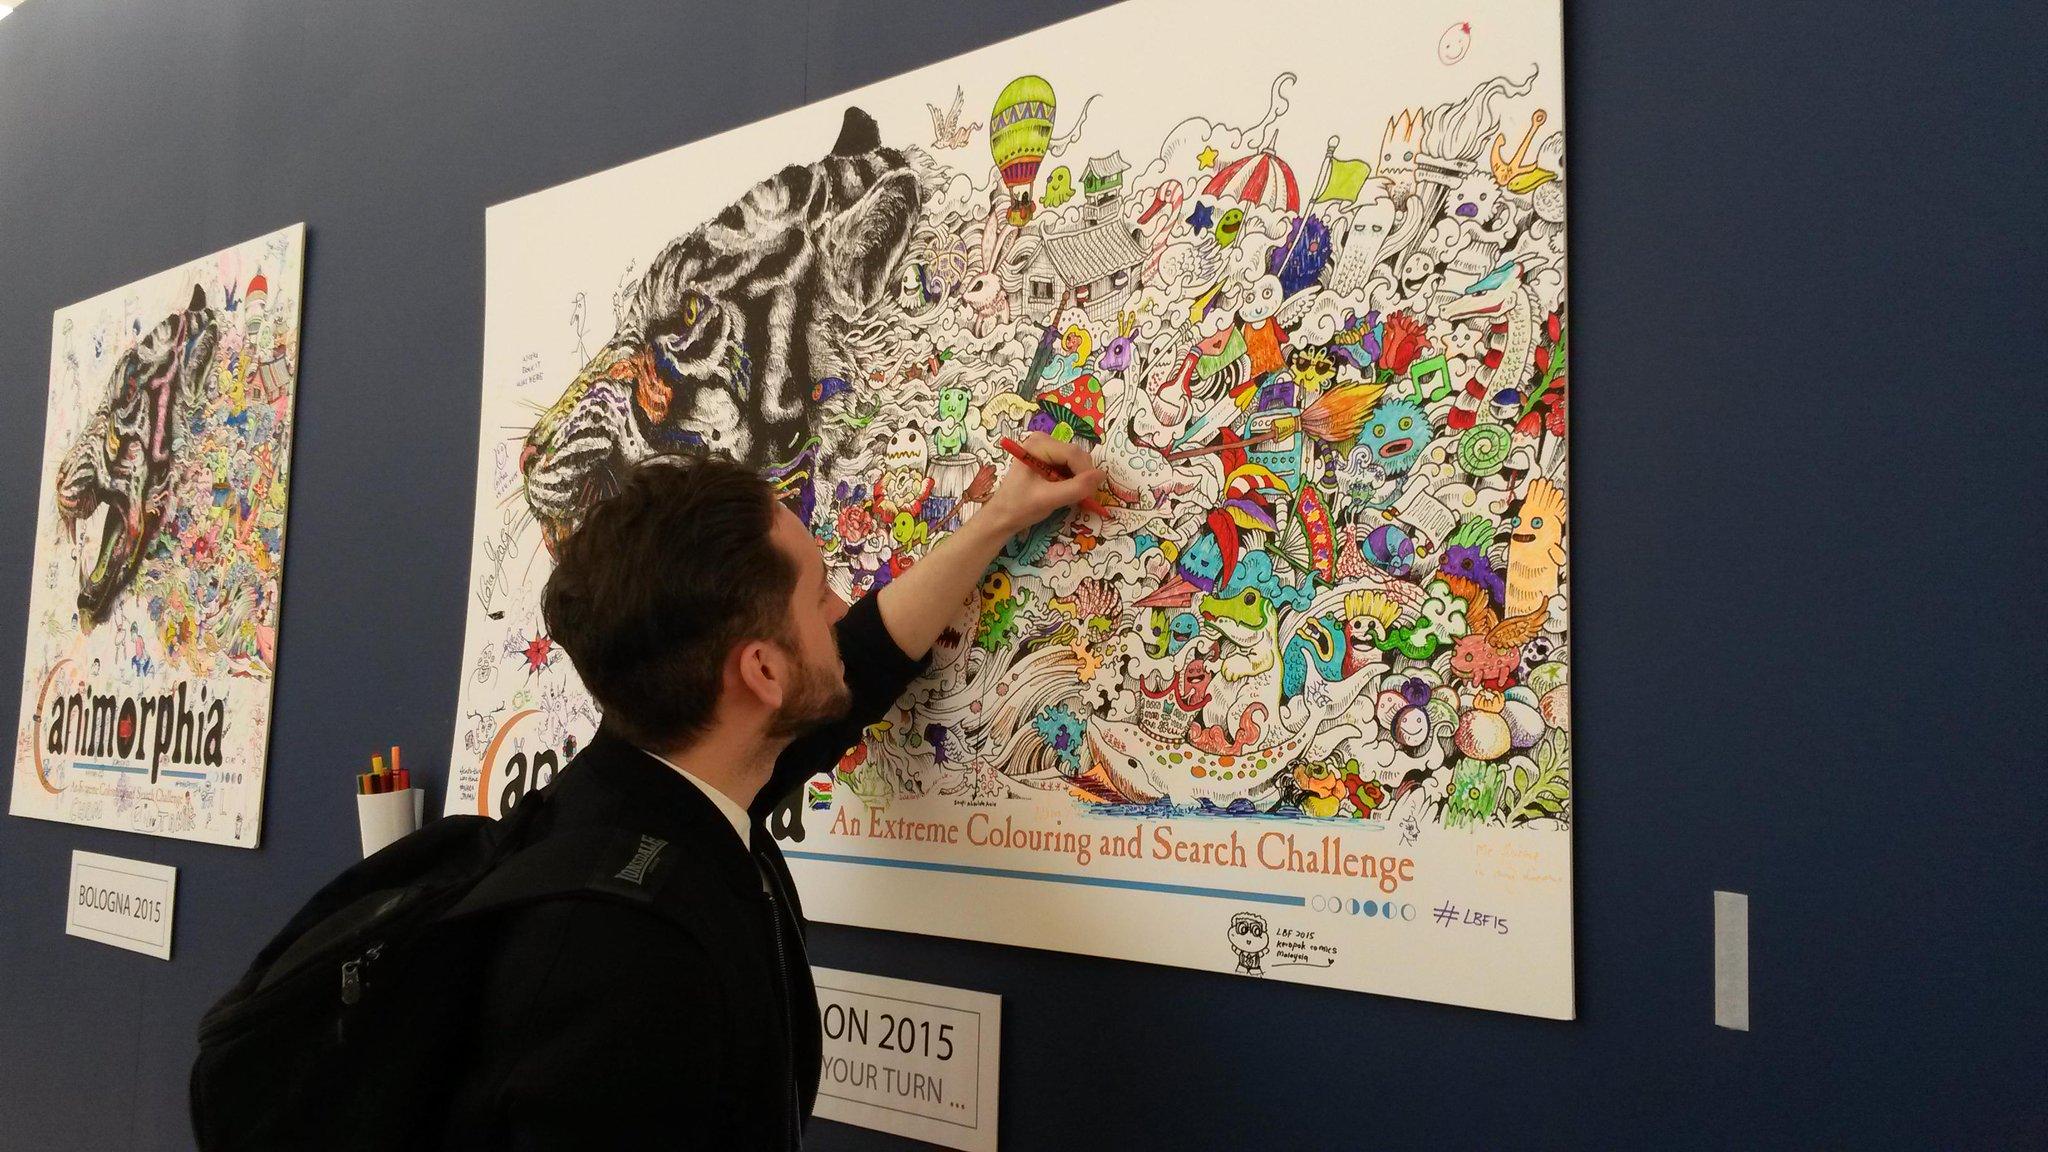 Art therapy coloring book michael omara - Michael O Mara Books On Twitter Bestselling Art Therapy Illustrator Richarddraws Enjoying Master Doodler Kerby_rosanes S Animorphia Poster Lbf15